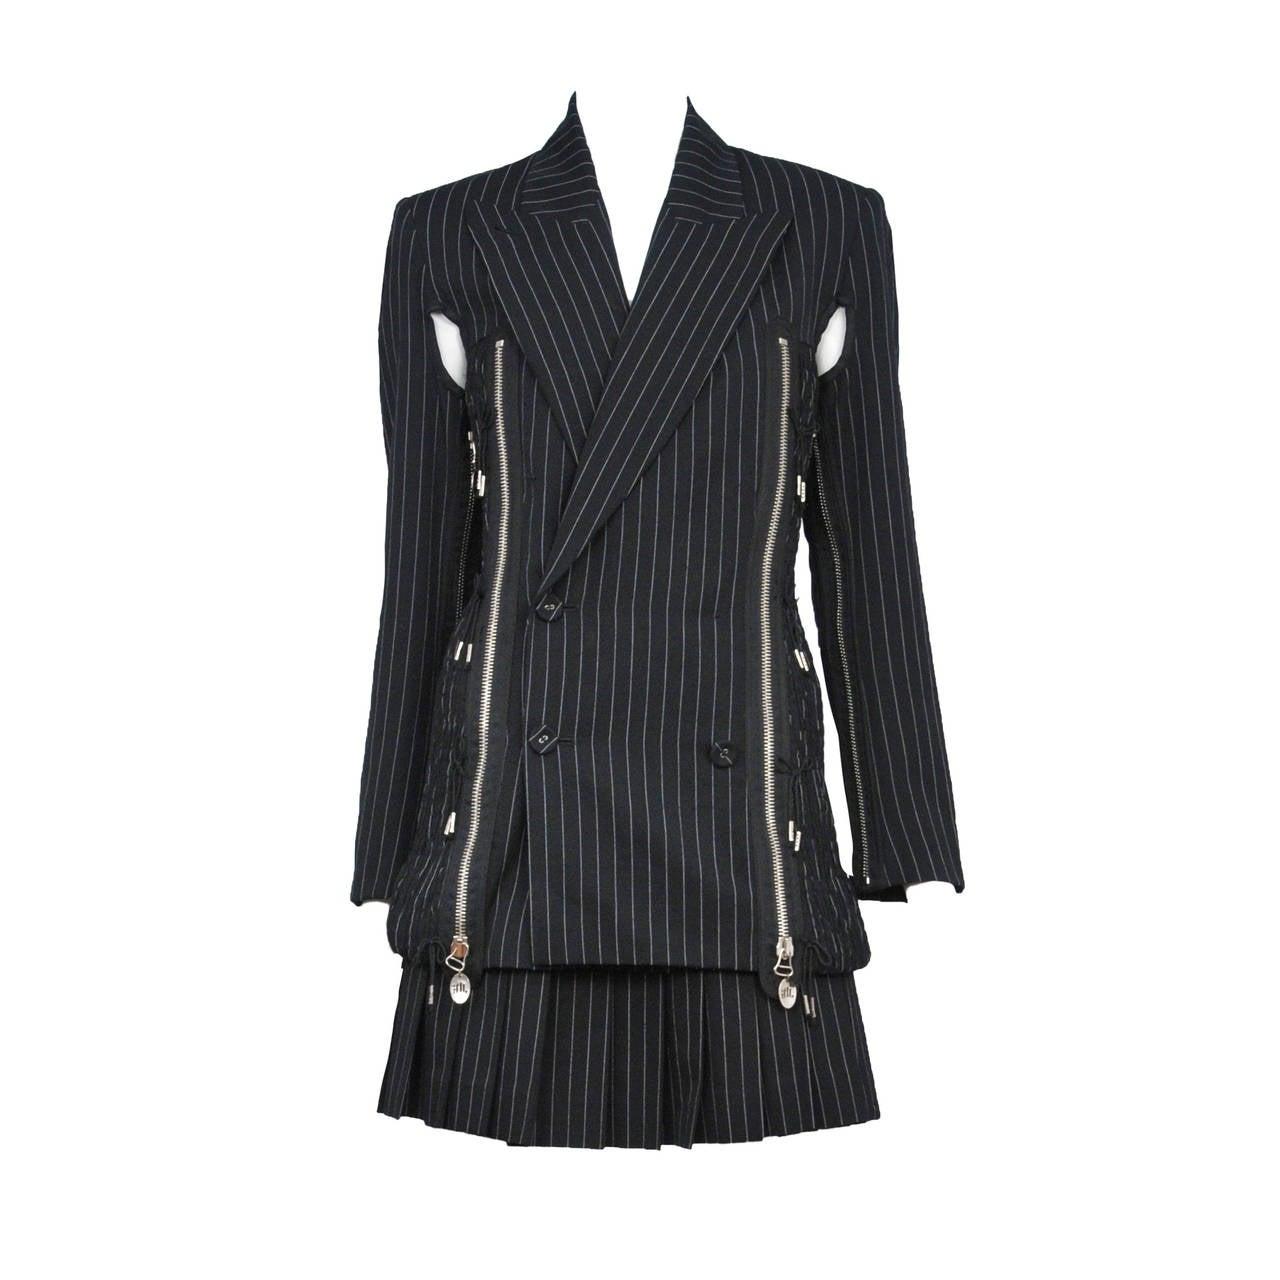 Gaultier Pin Stripe Zipper Suit 1